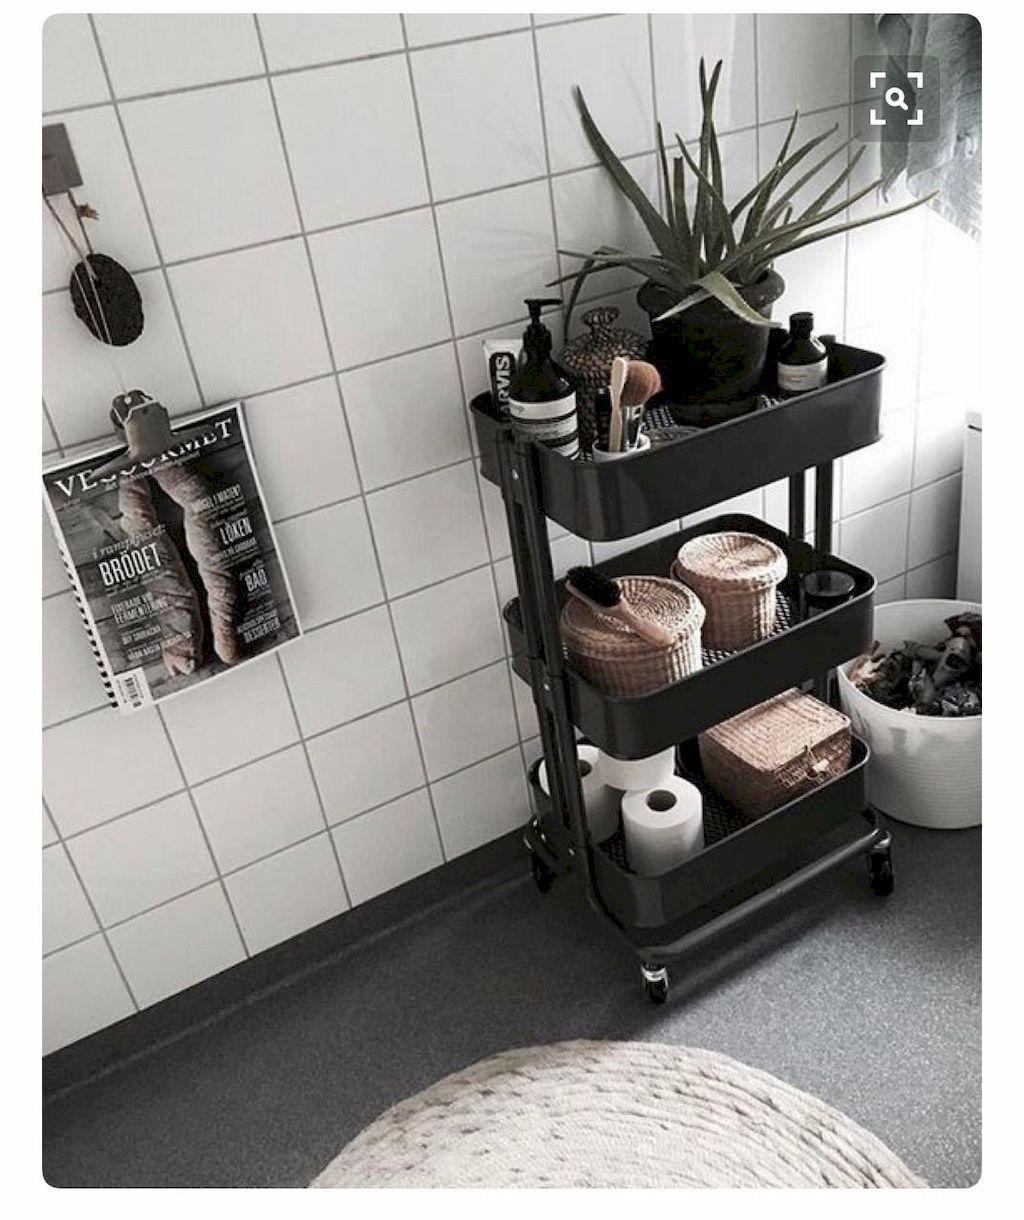 60+ Easy and Effective Small Bathroom Organization Ideas